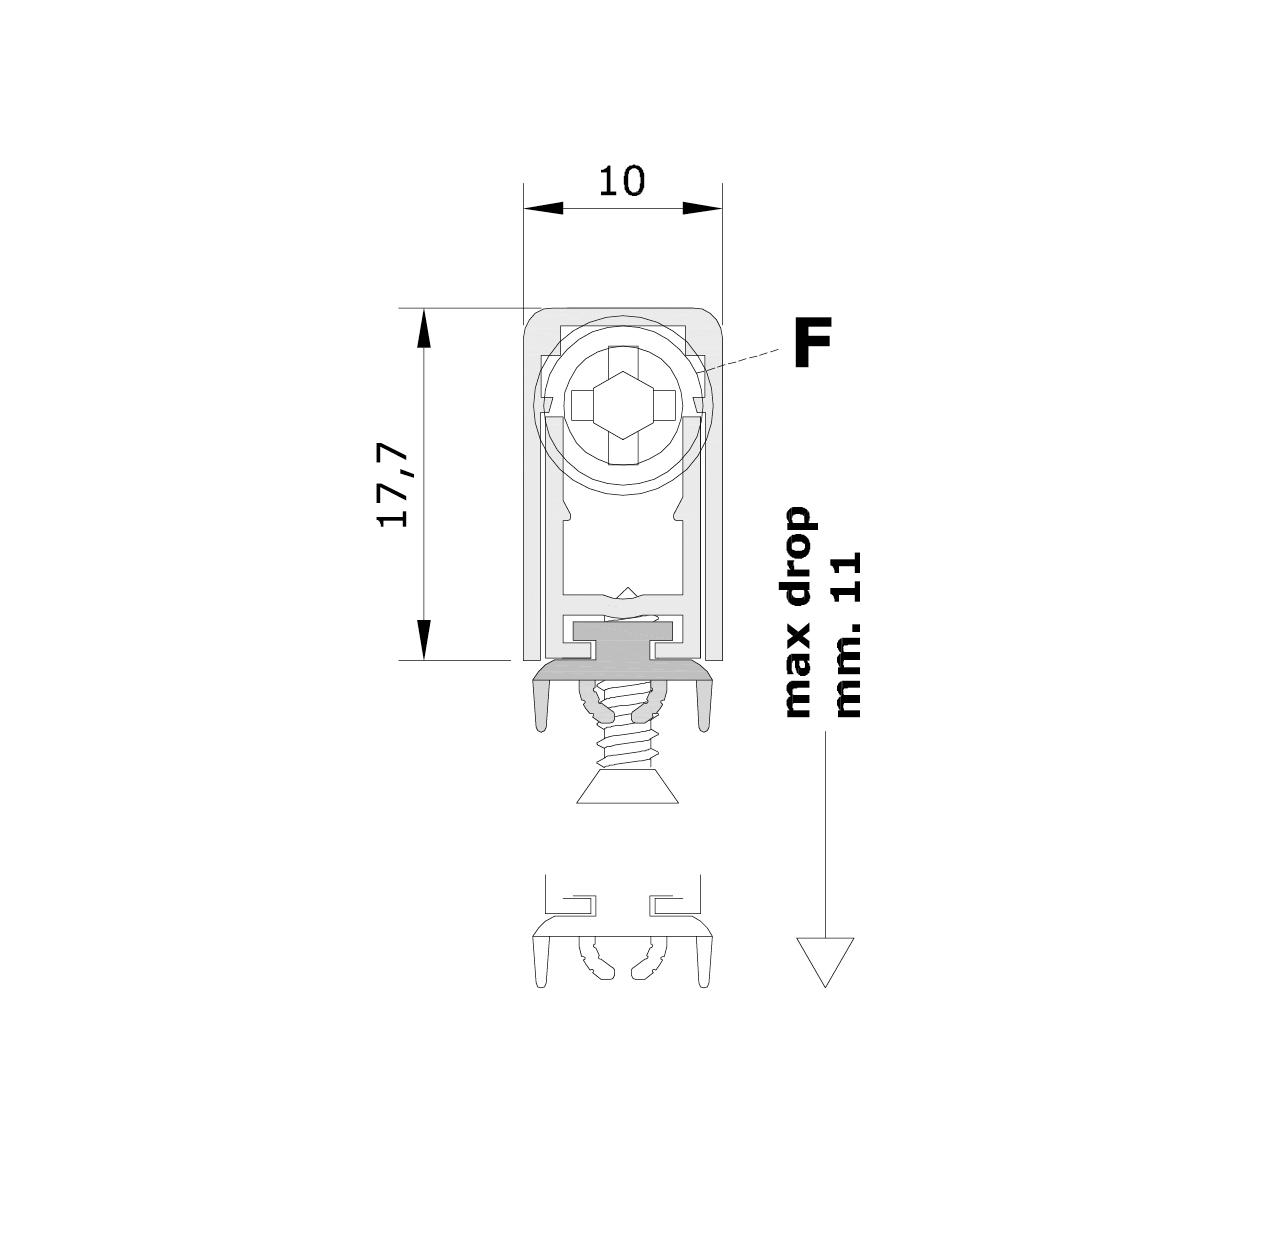 Misure standard (mm) per il paraspifferi Serie Special 970